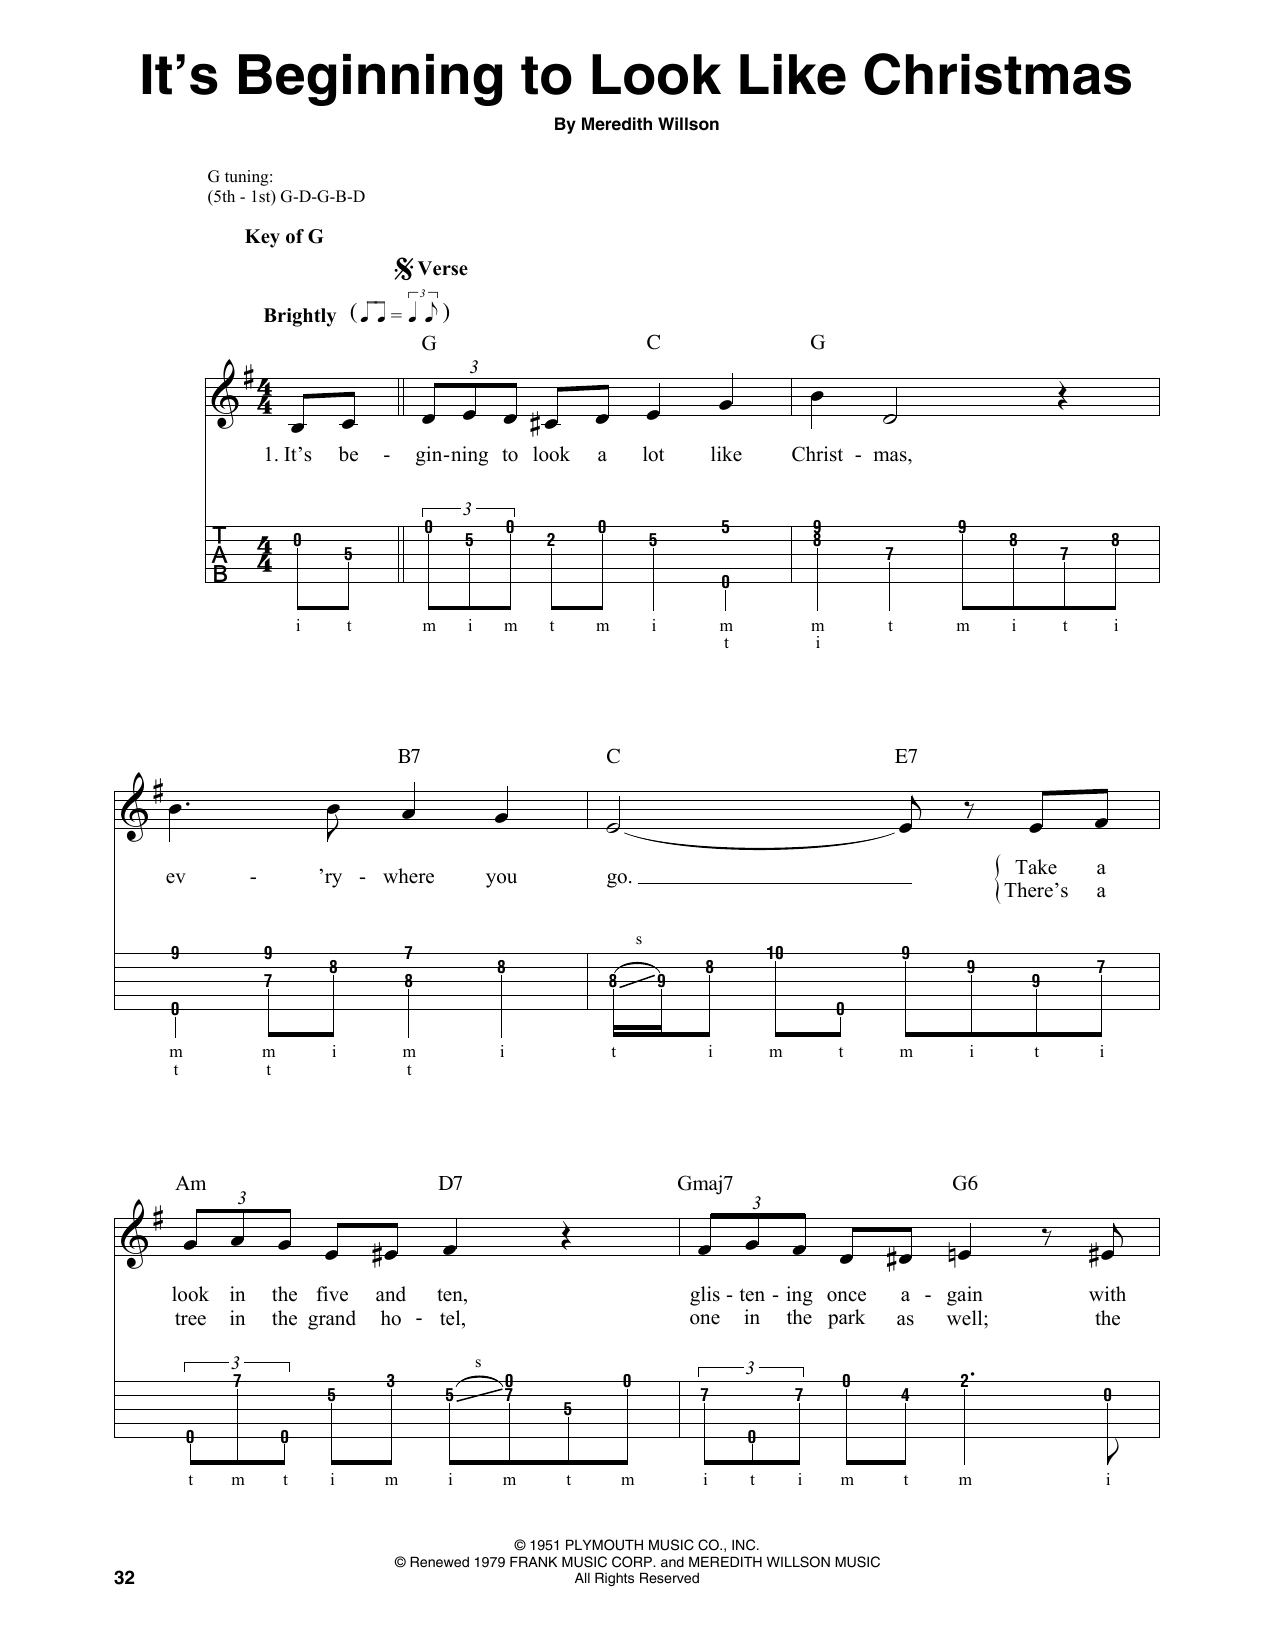 It's Beginning To Look Like Christmas (Banjo Tab)